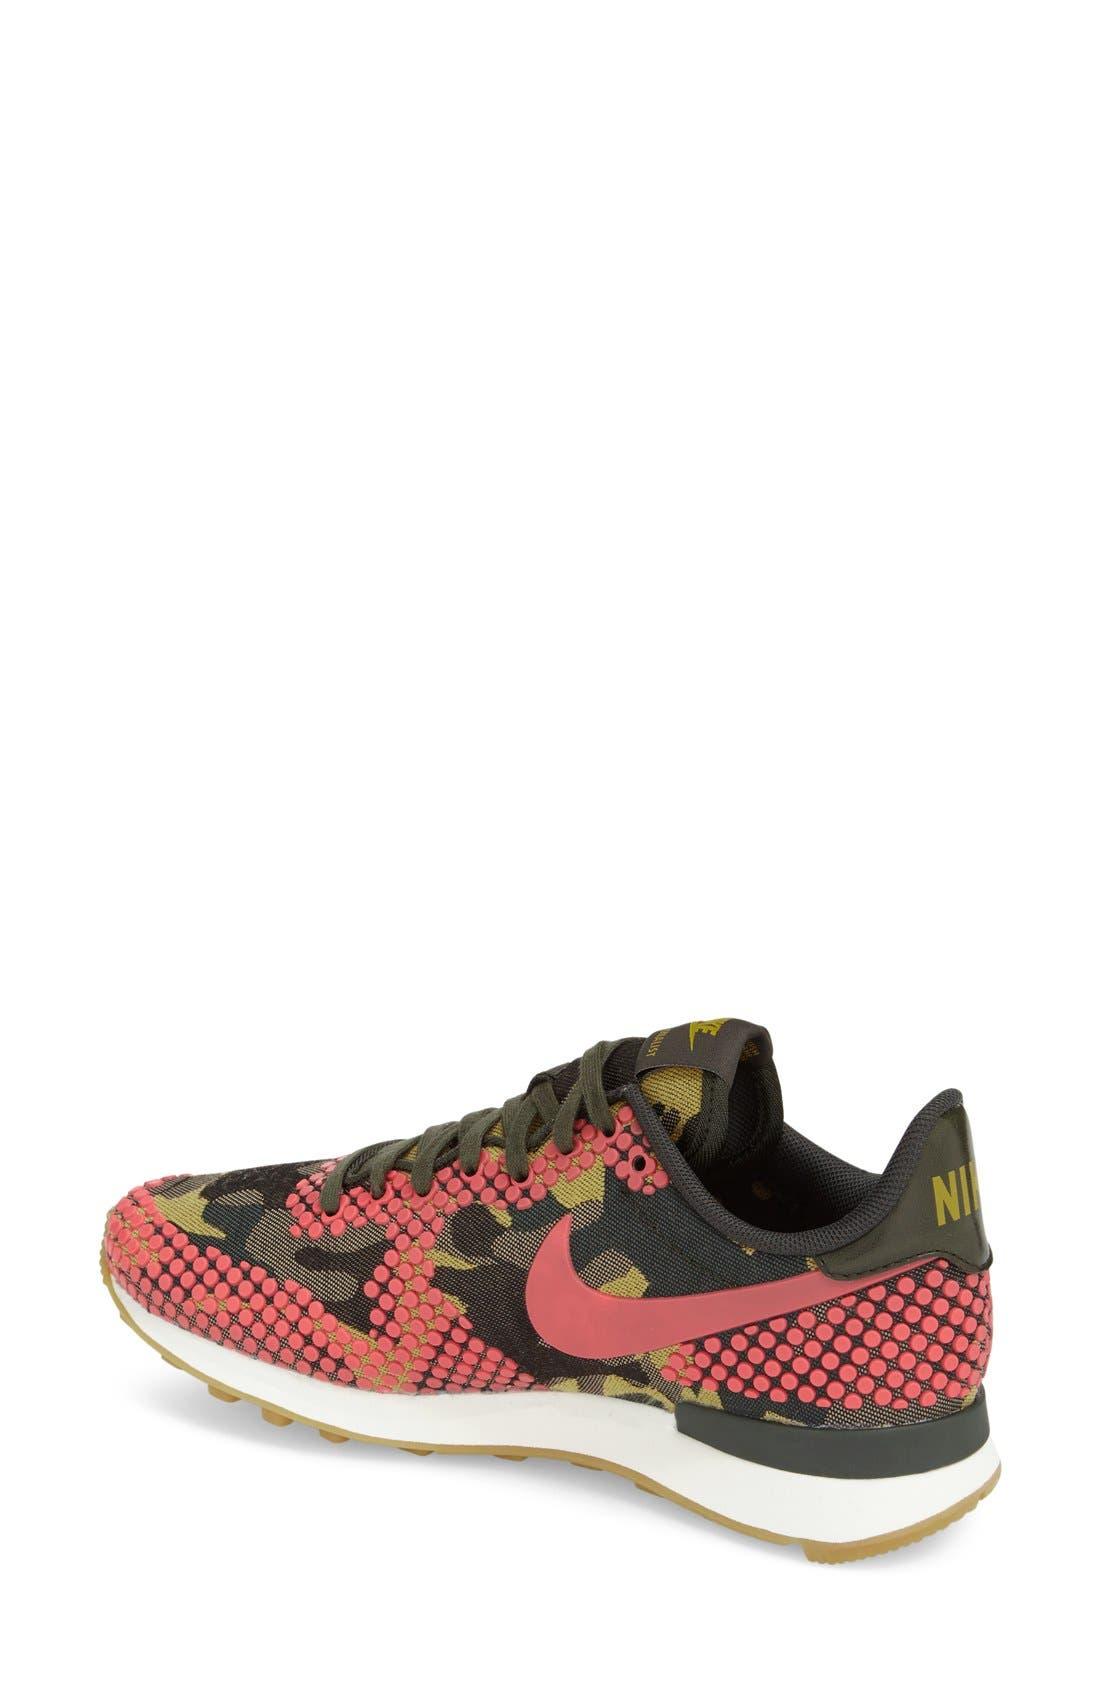 Alternate Image 2  - Nike 'Internationalist' Print Sneaker (Women)